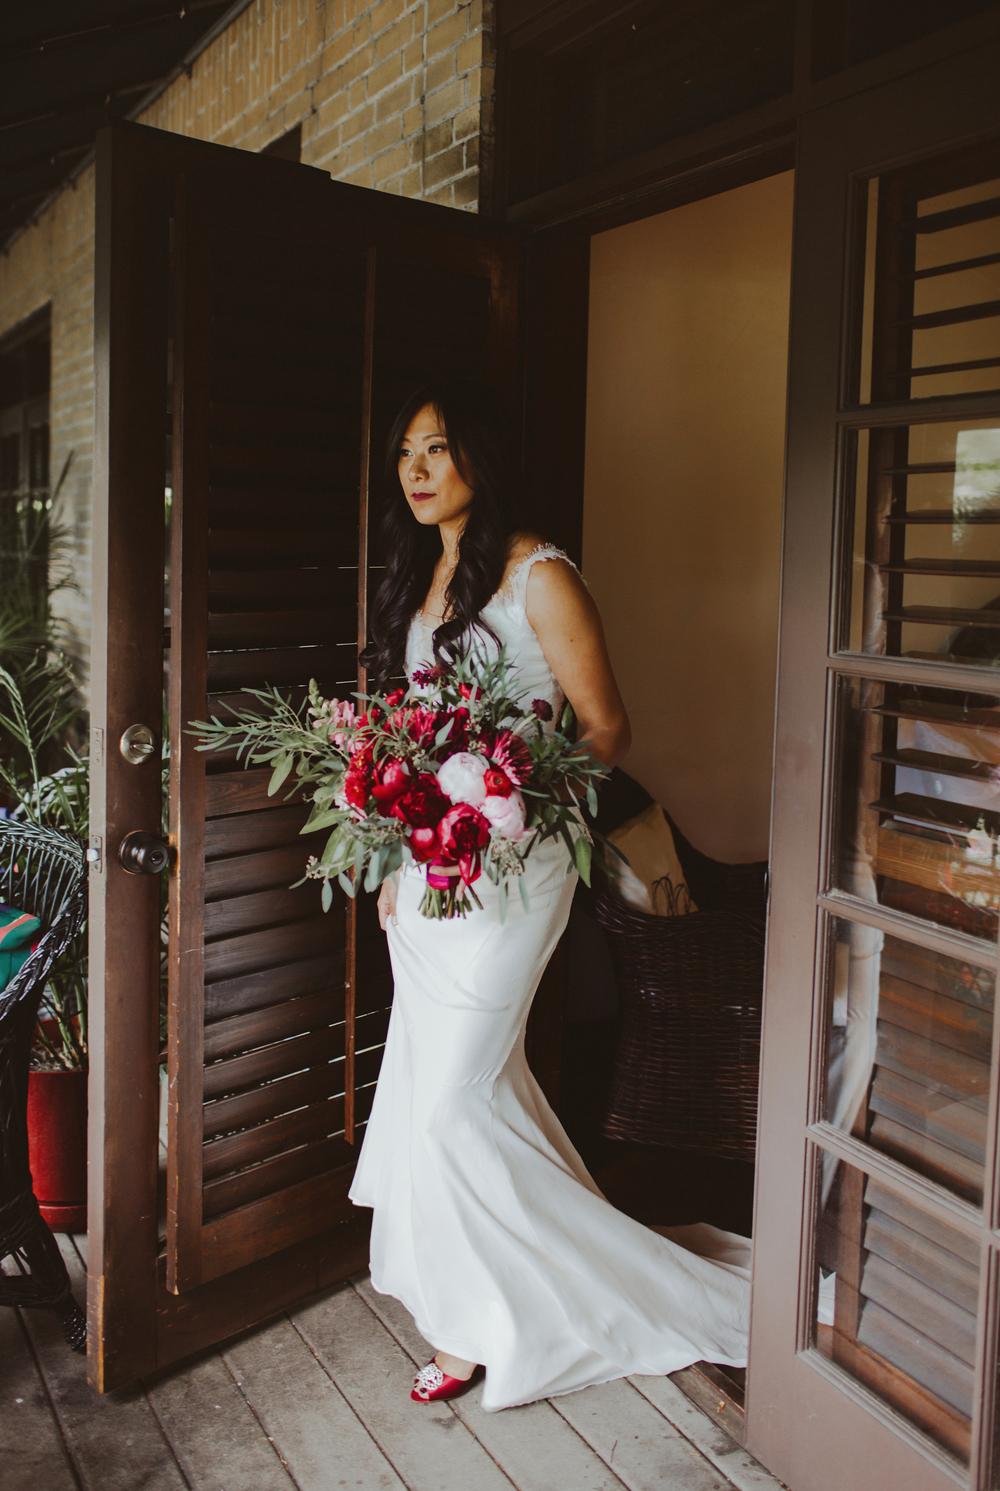 Wedding Day | Vanessa Boy Photography | vanessaboy.com-25.com final.jpg